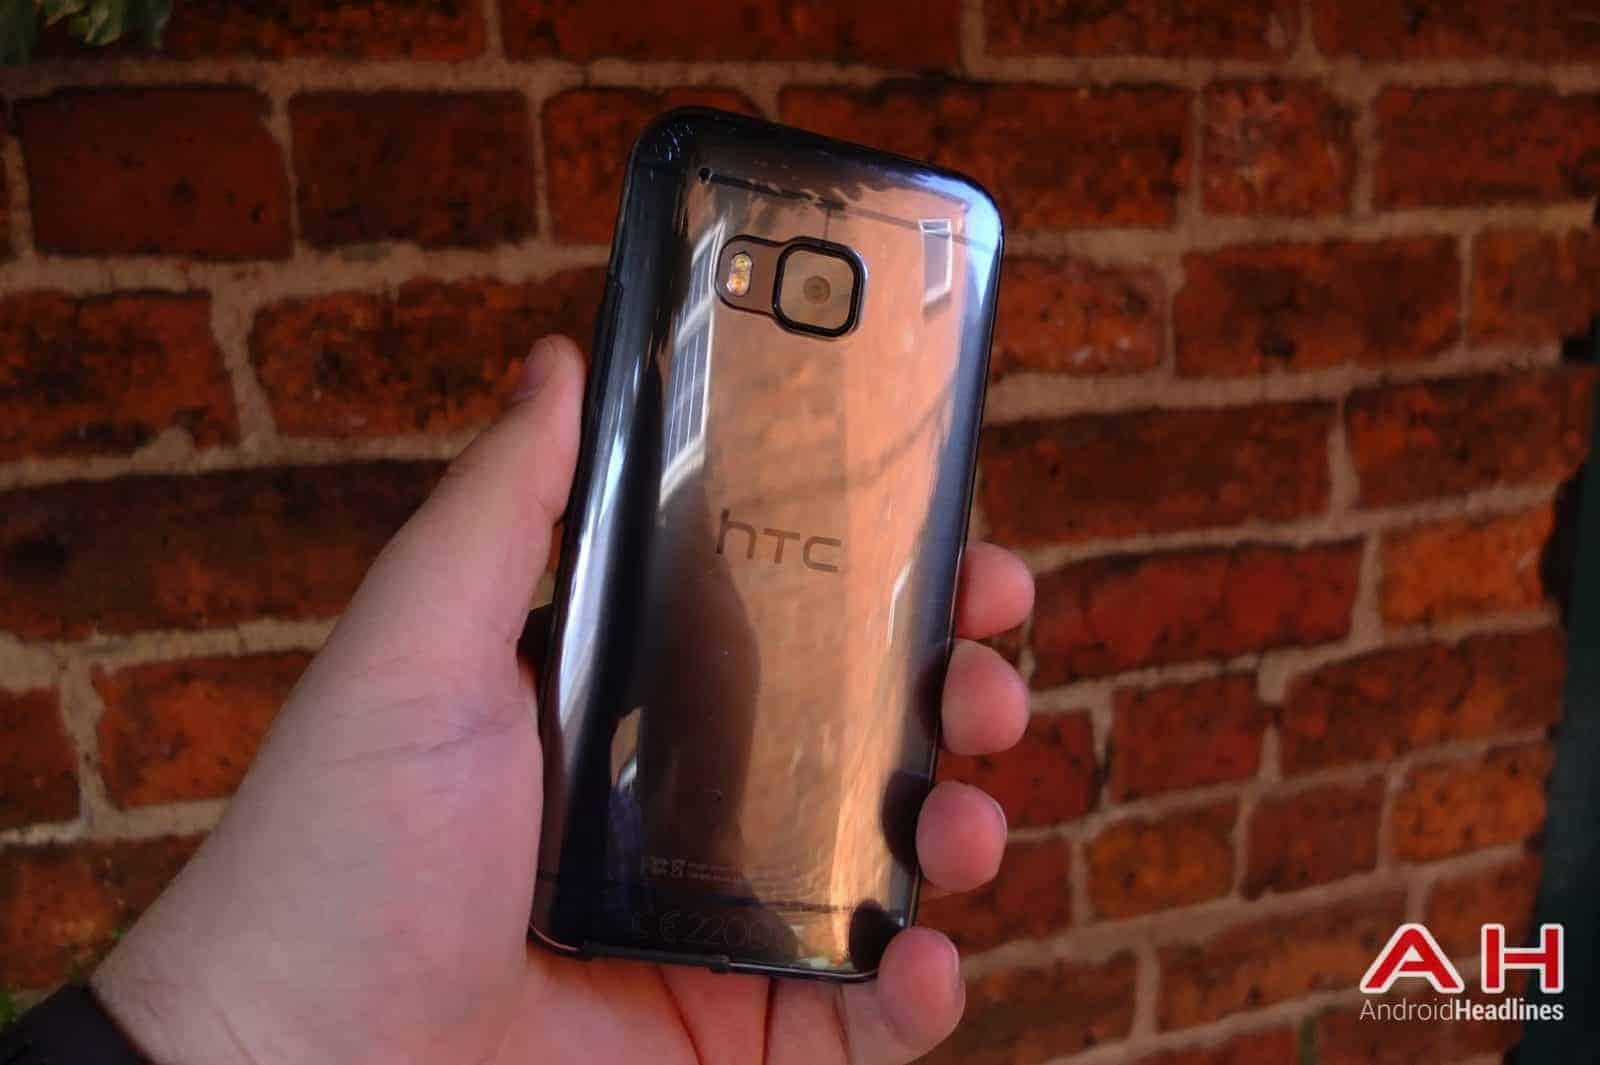 HTC One M9 Clear Case AH 07